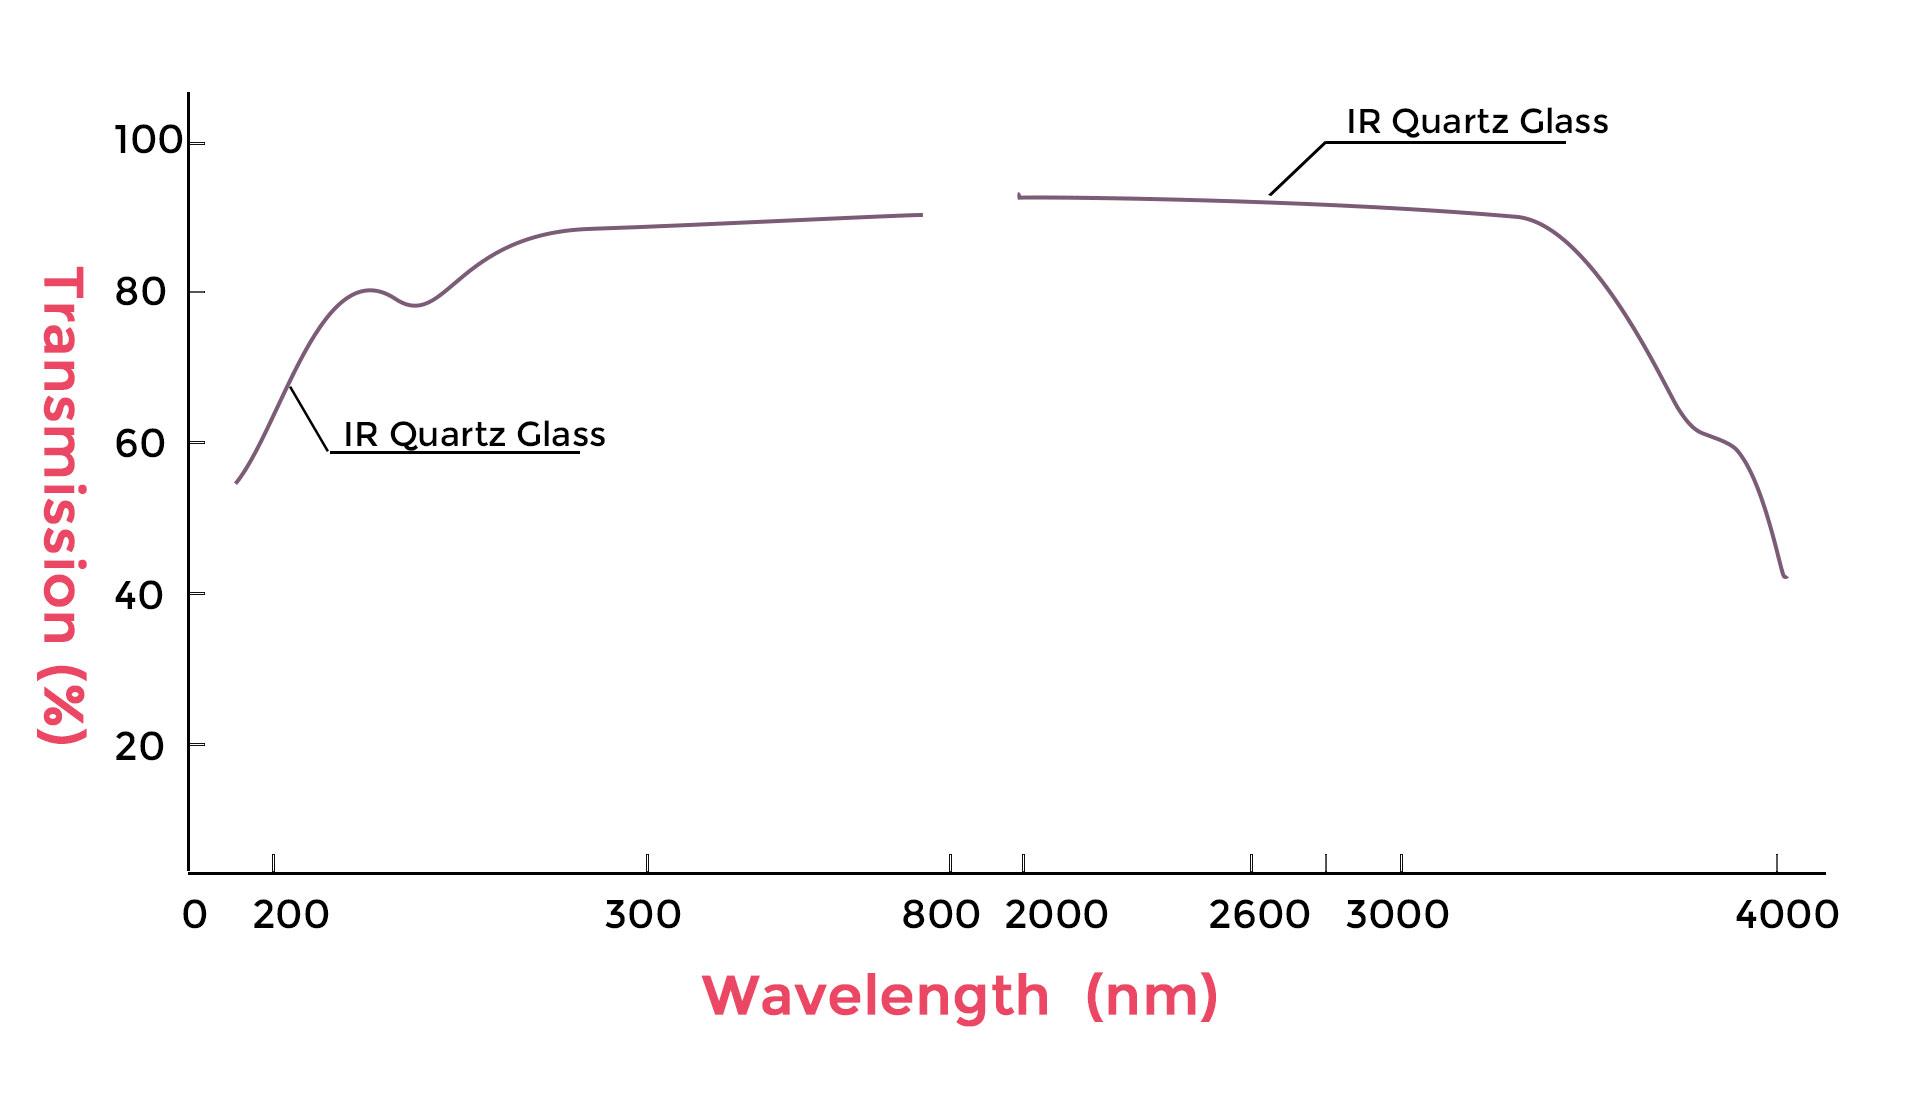 IR Quartz Glass Transmission